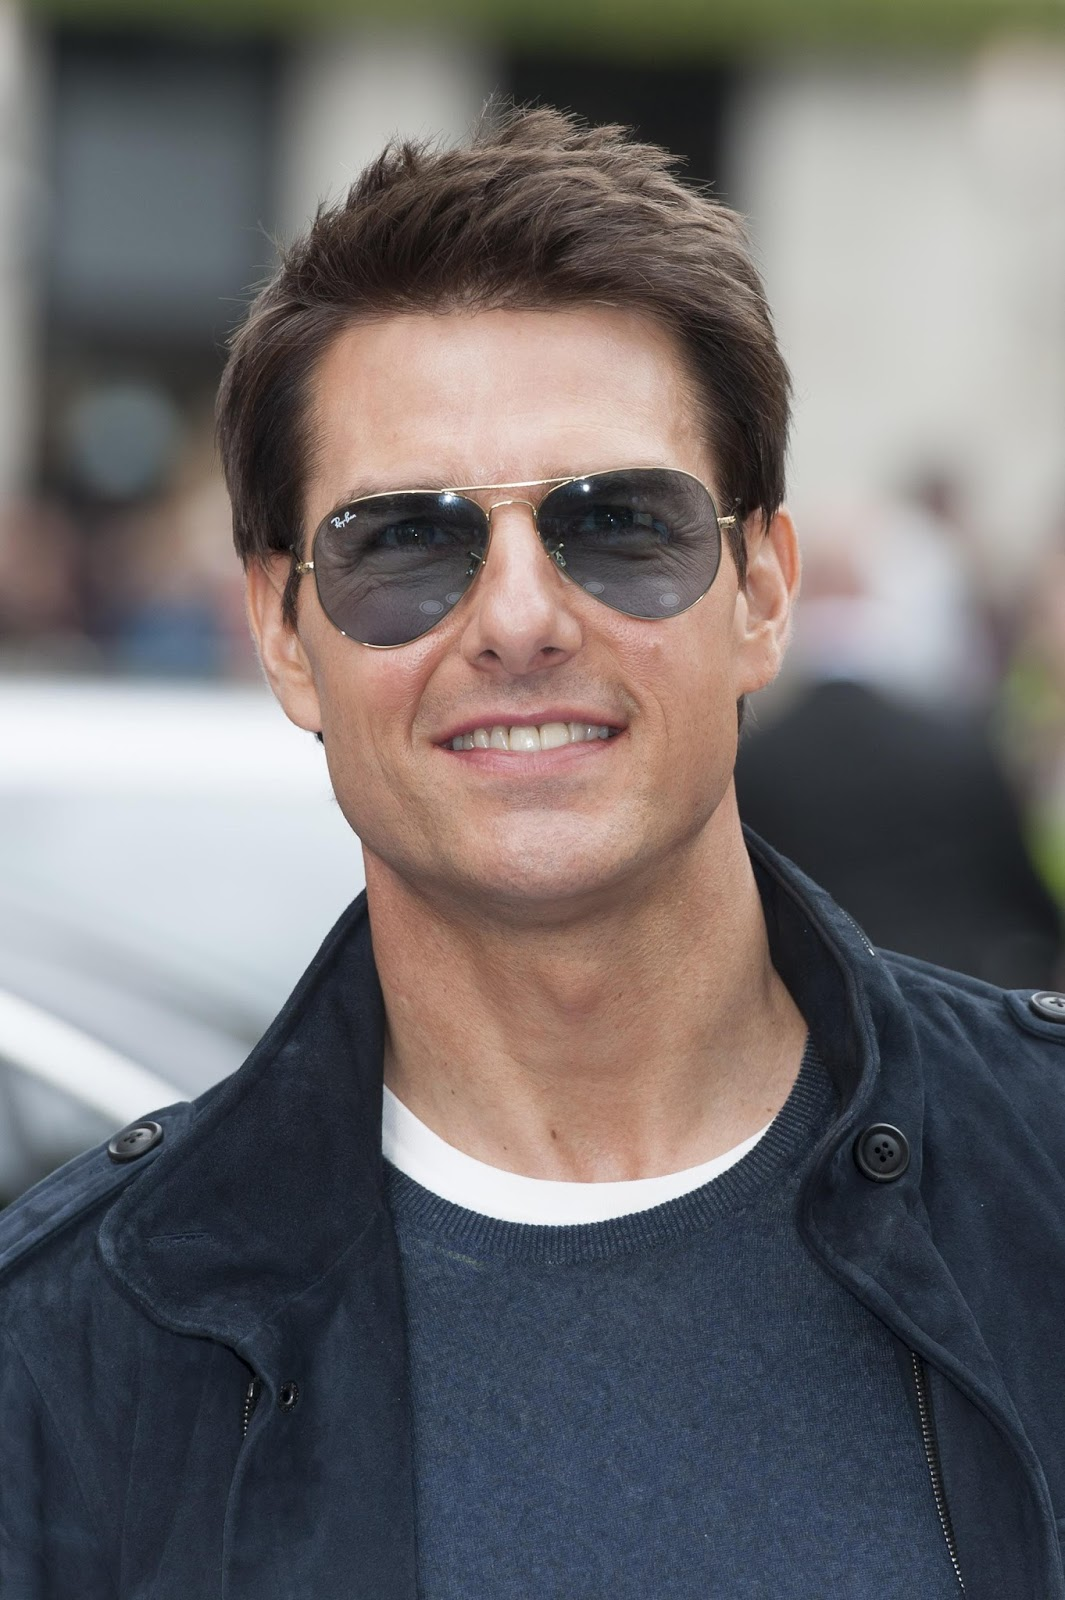 Tom Cruise - Fashion Yep Tom Cruise